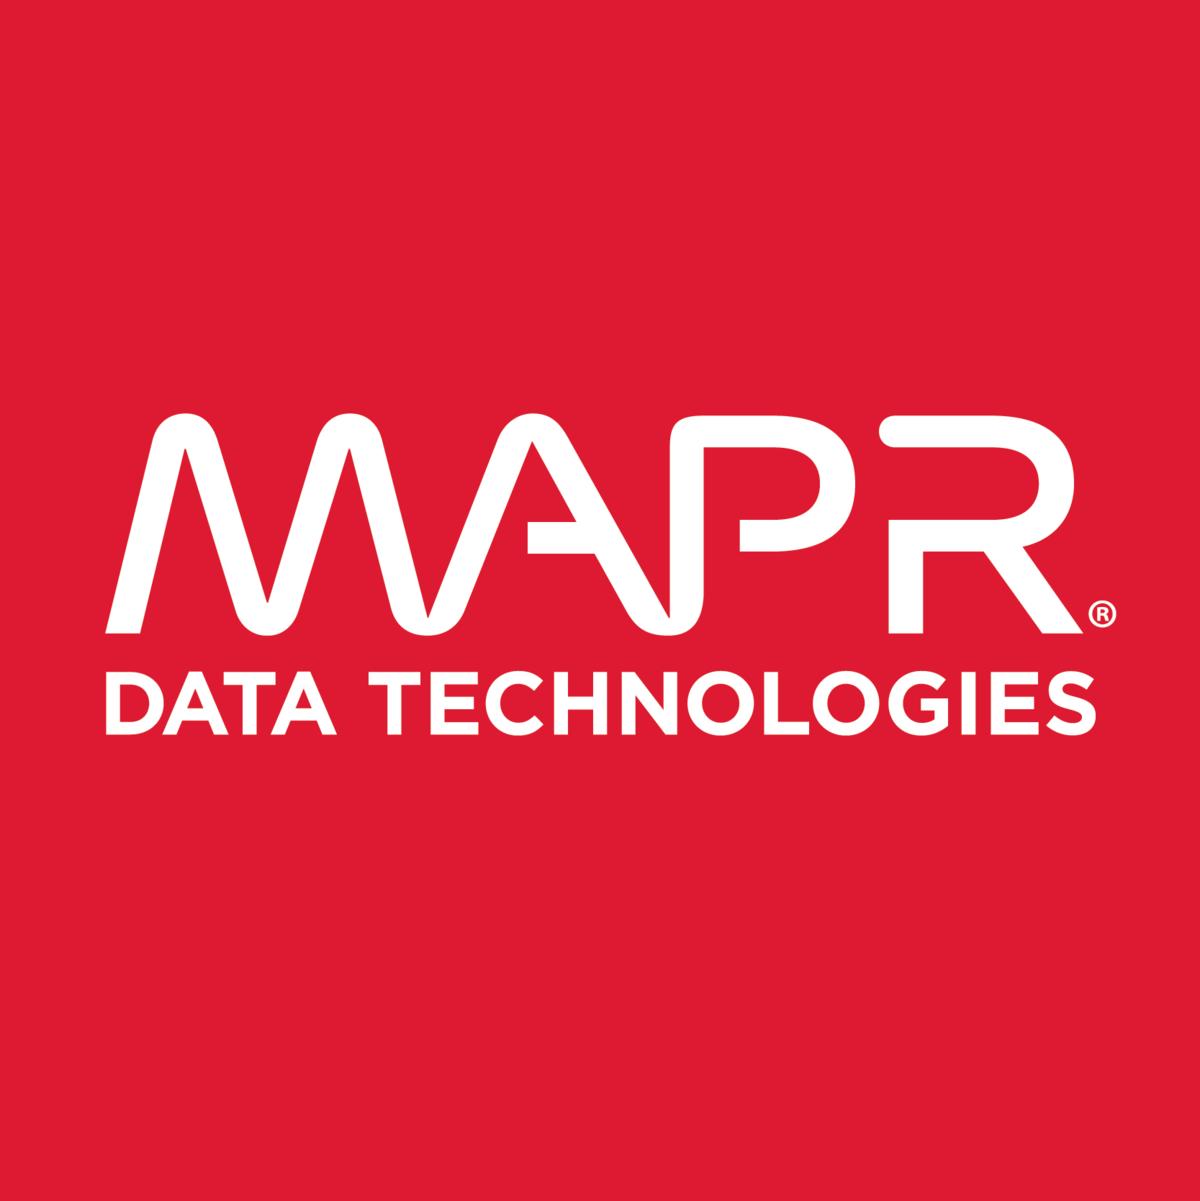 Mapr Wikipedia